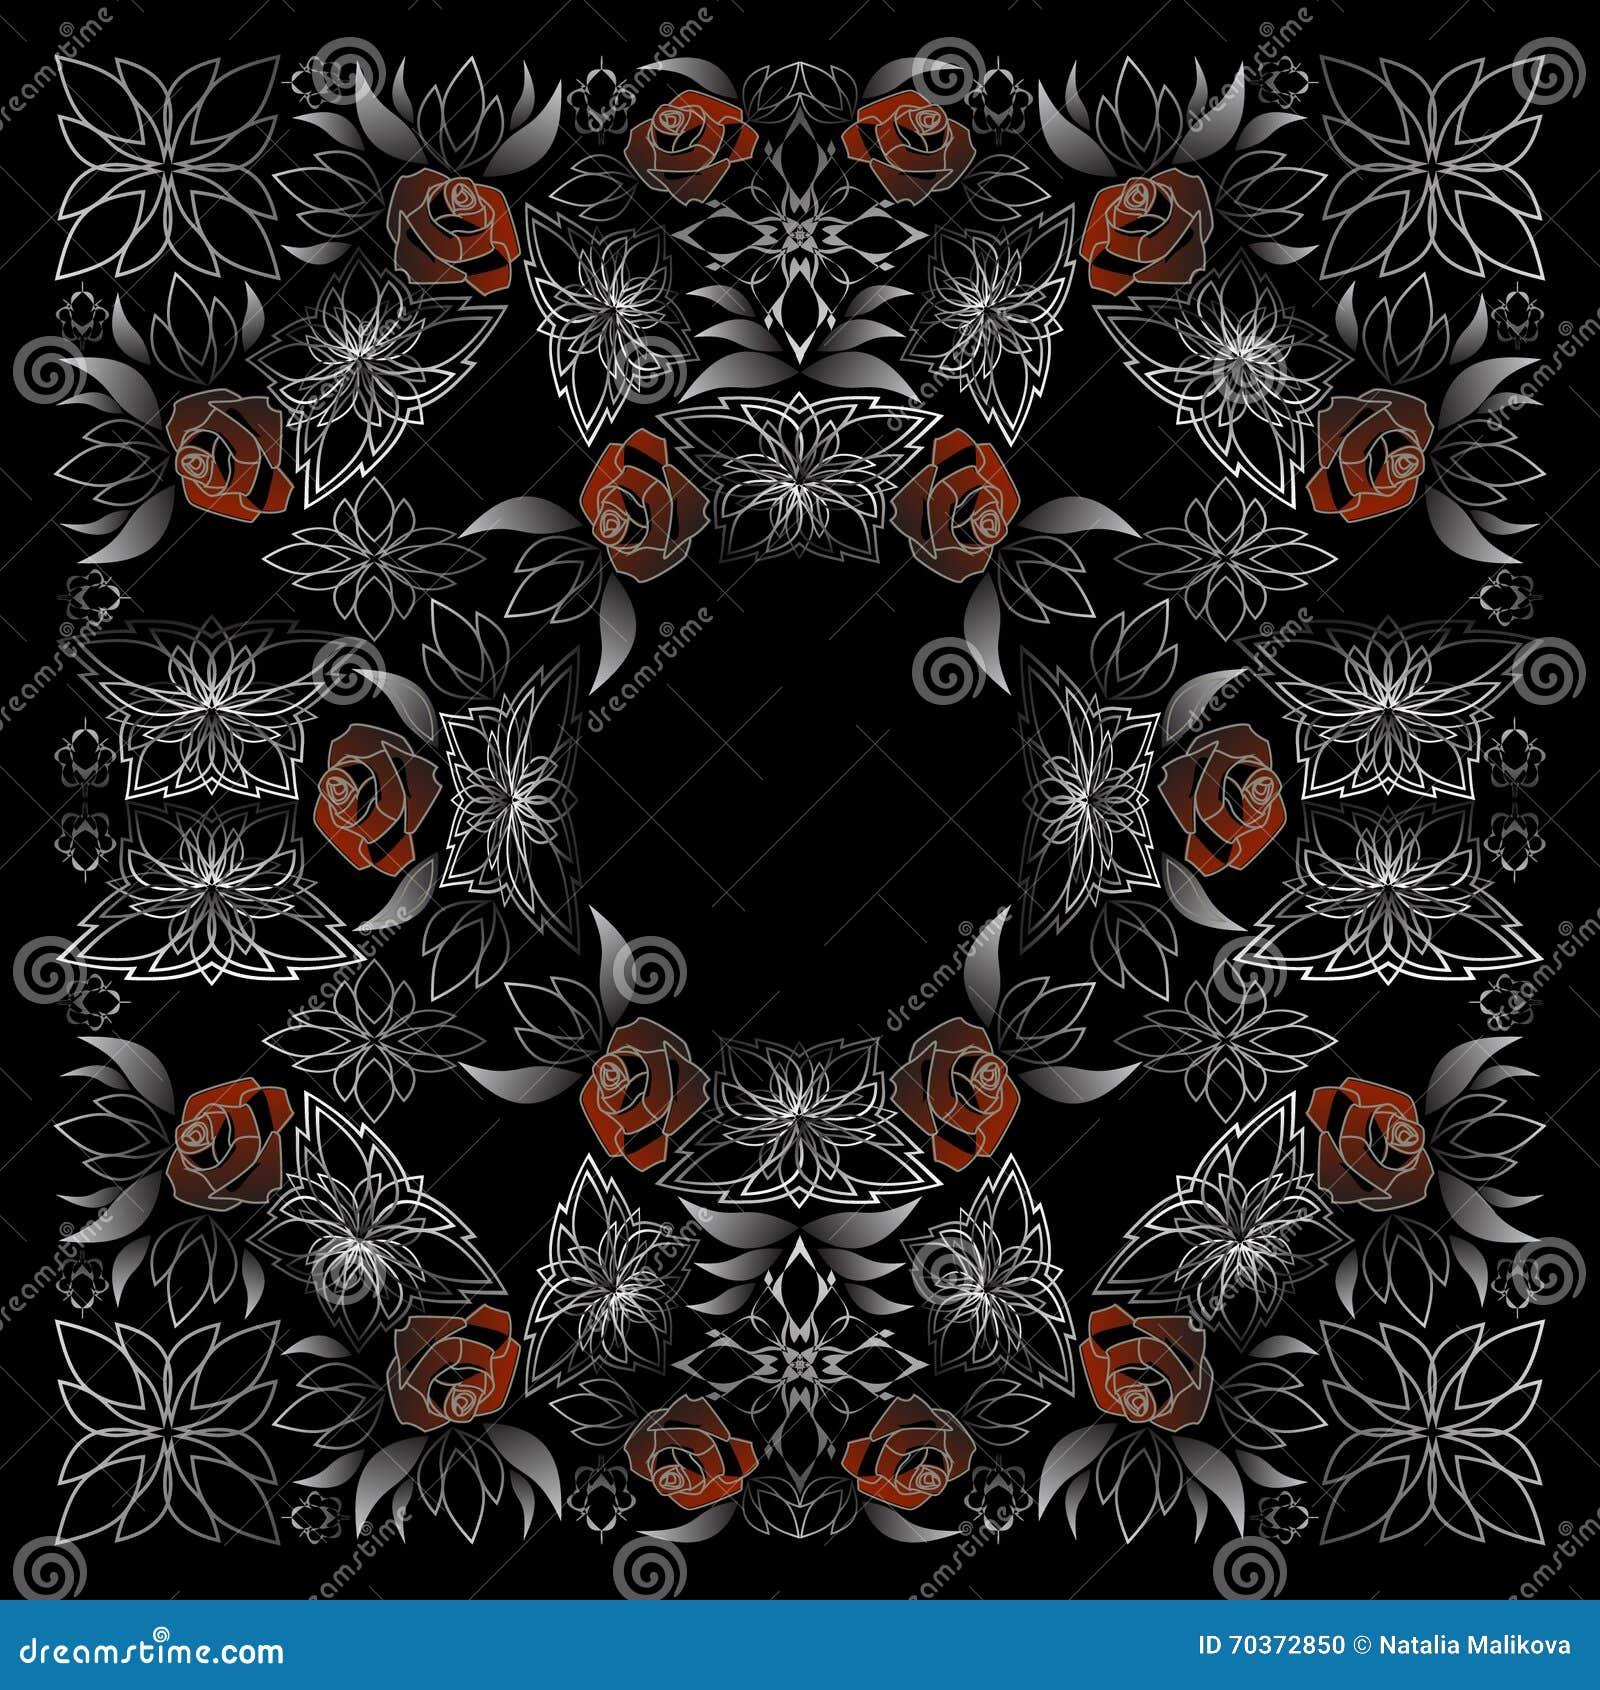 bandana white and black pattern with roses stock illustration